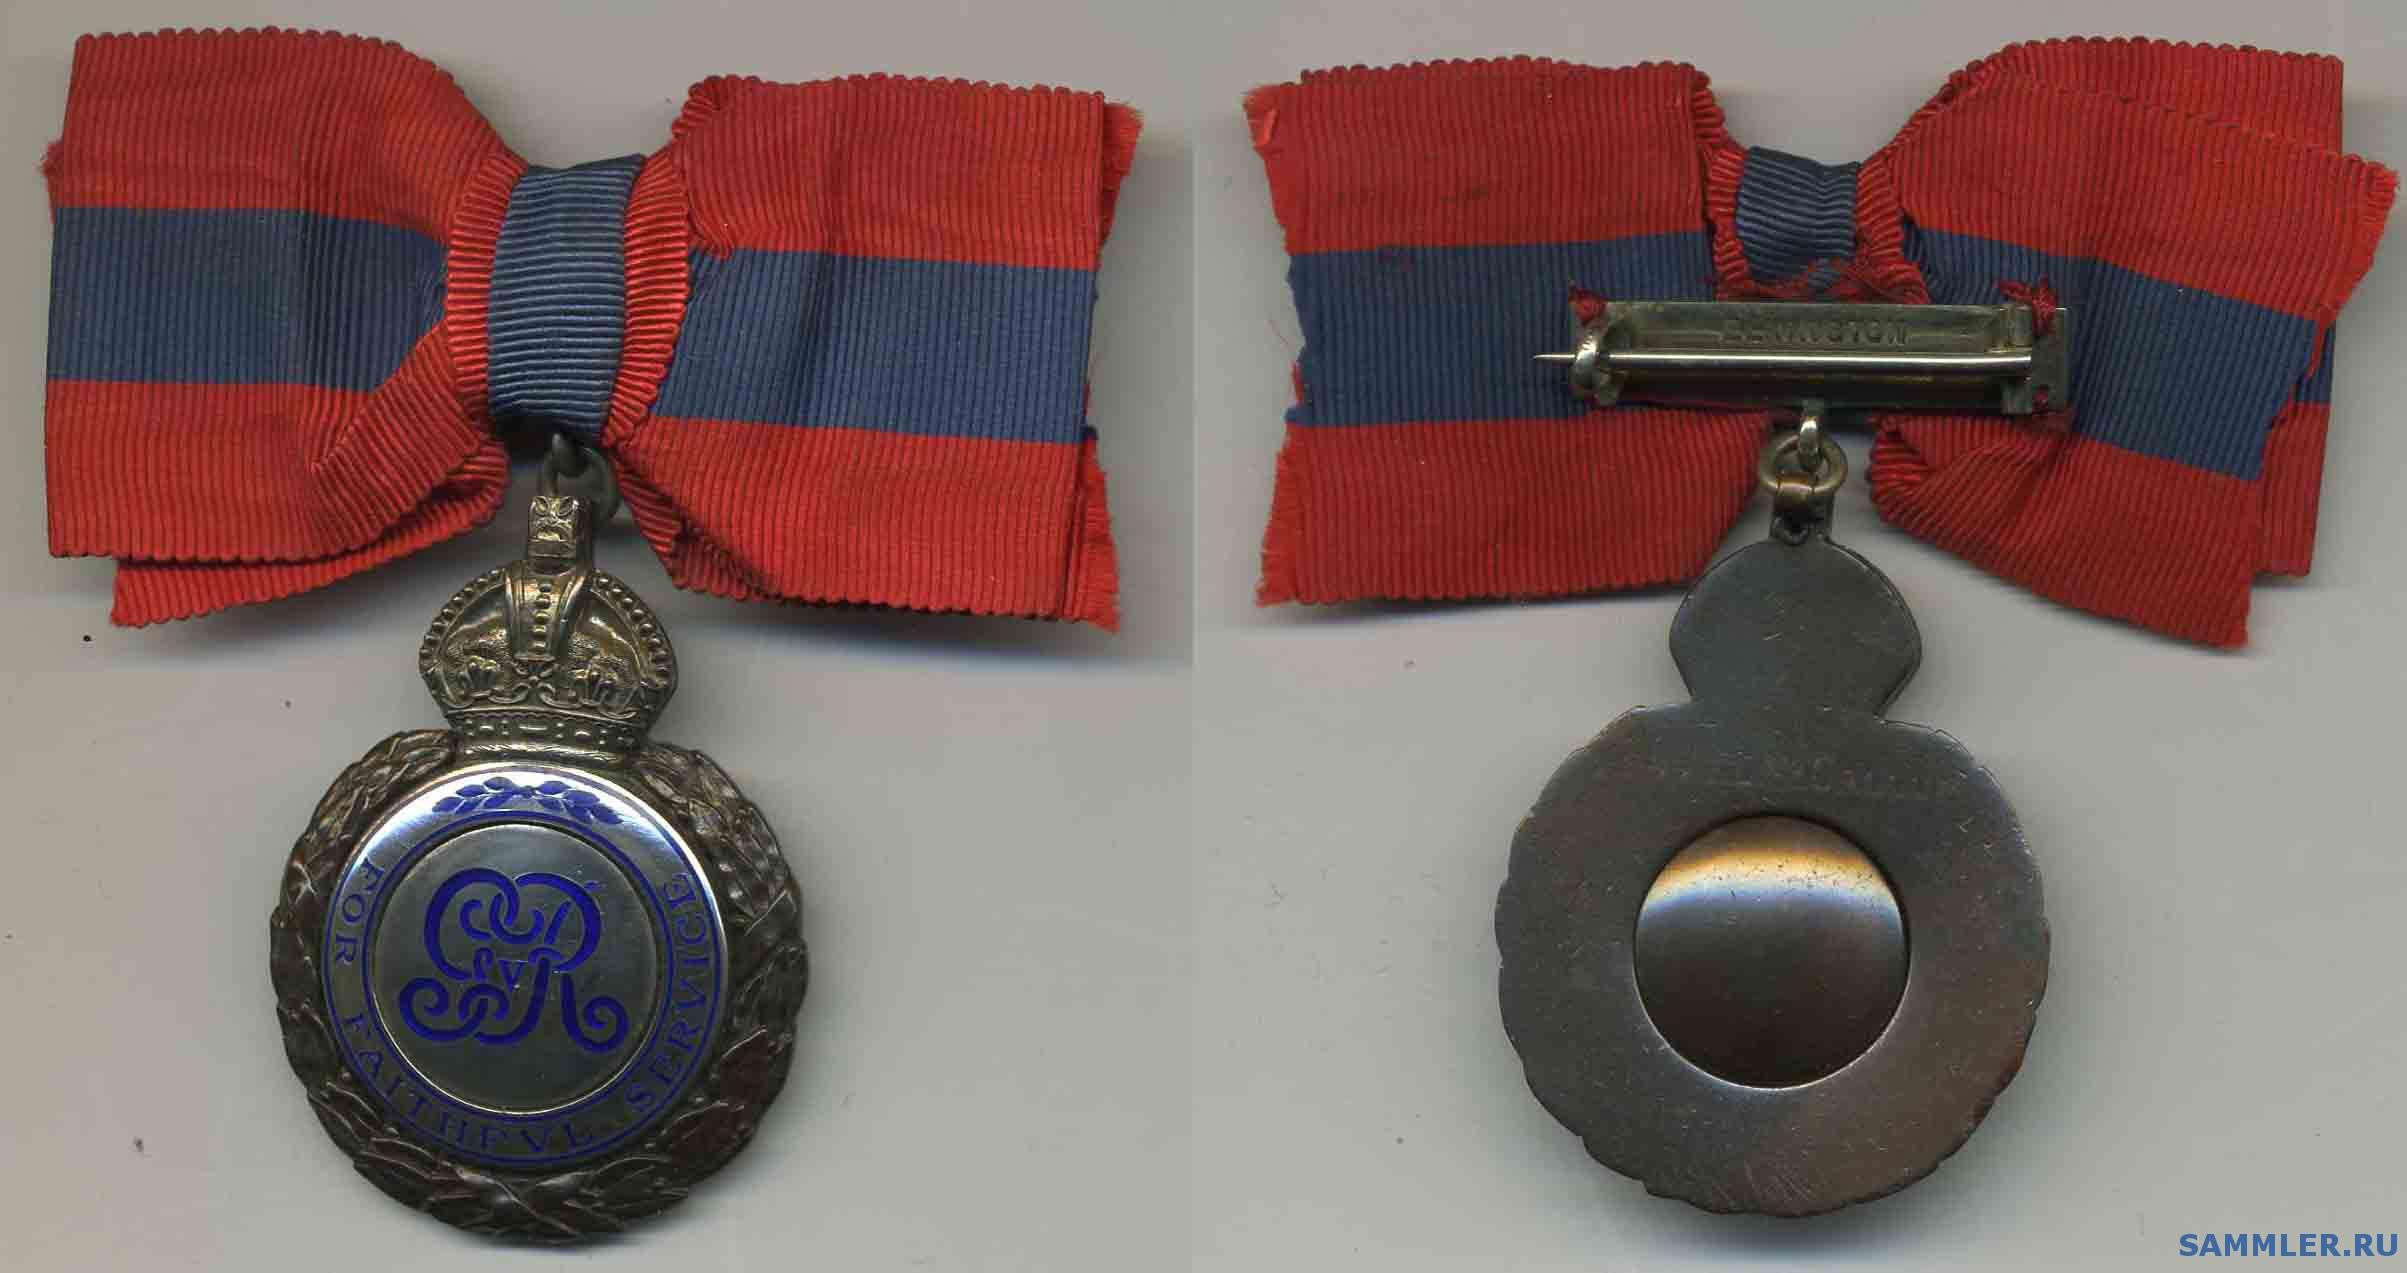 Imperial_Service_Medal_d1.jpg